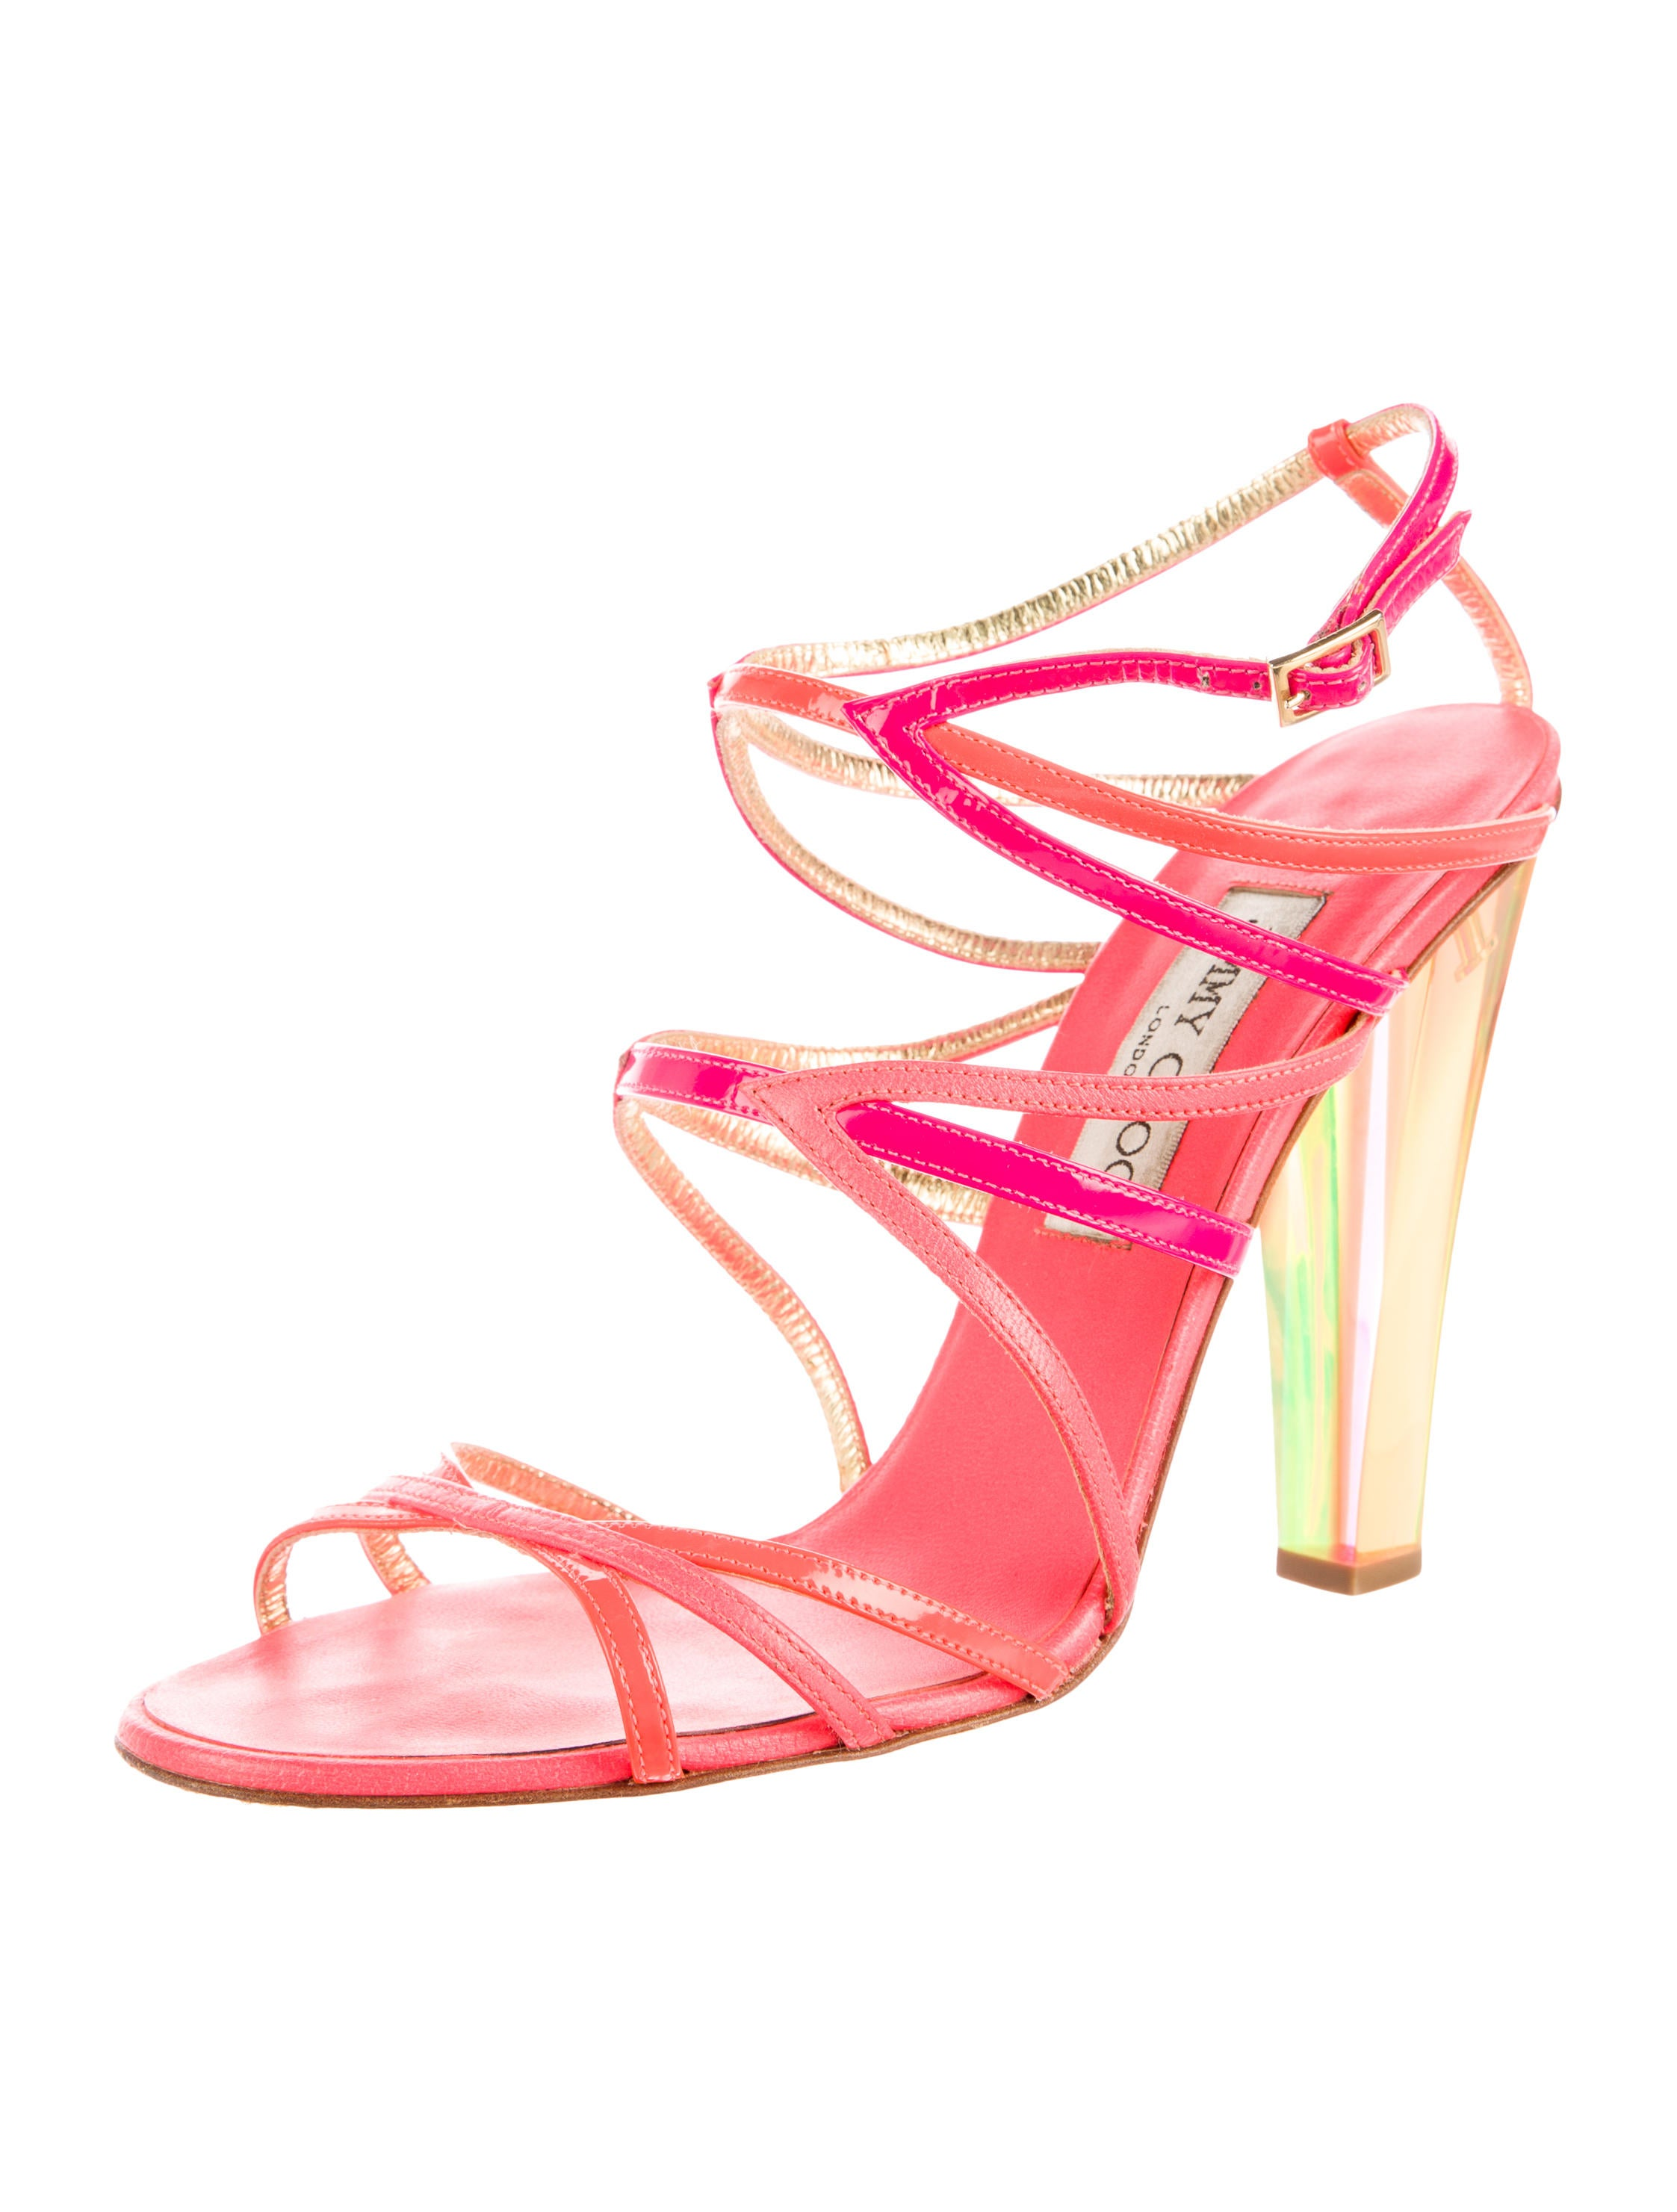 jimmy choo multistrap neon sandals shoes jim50792